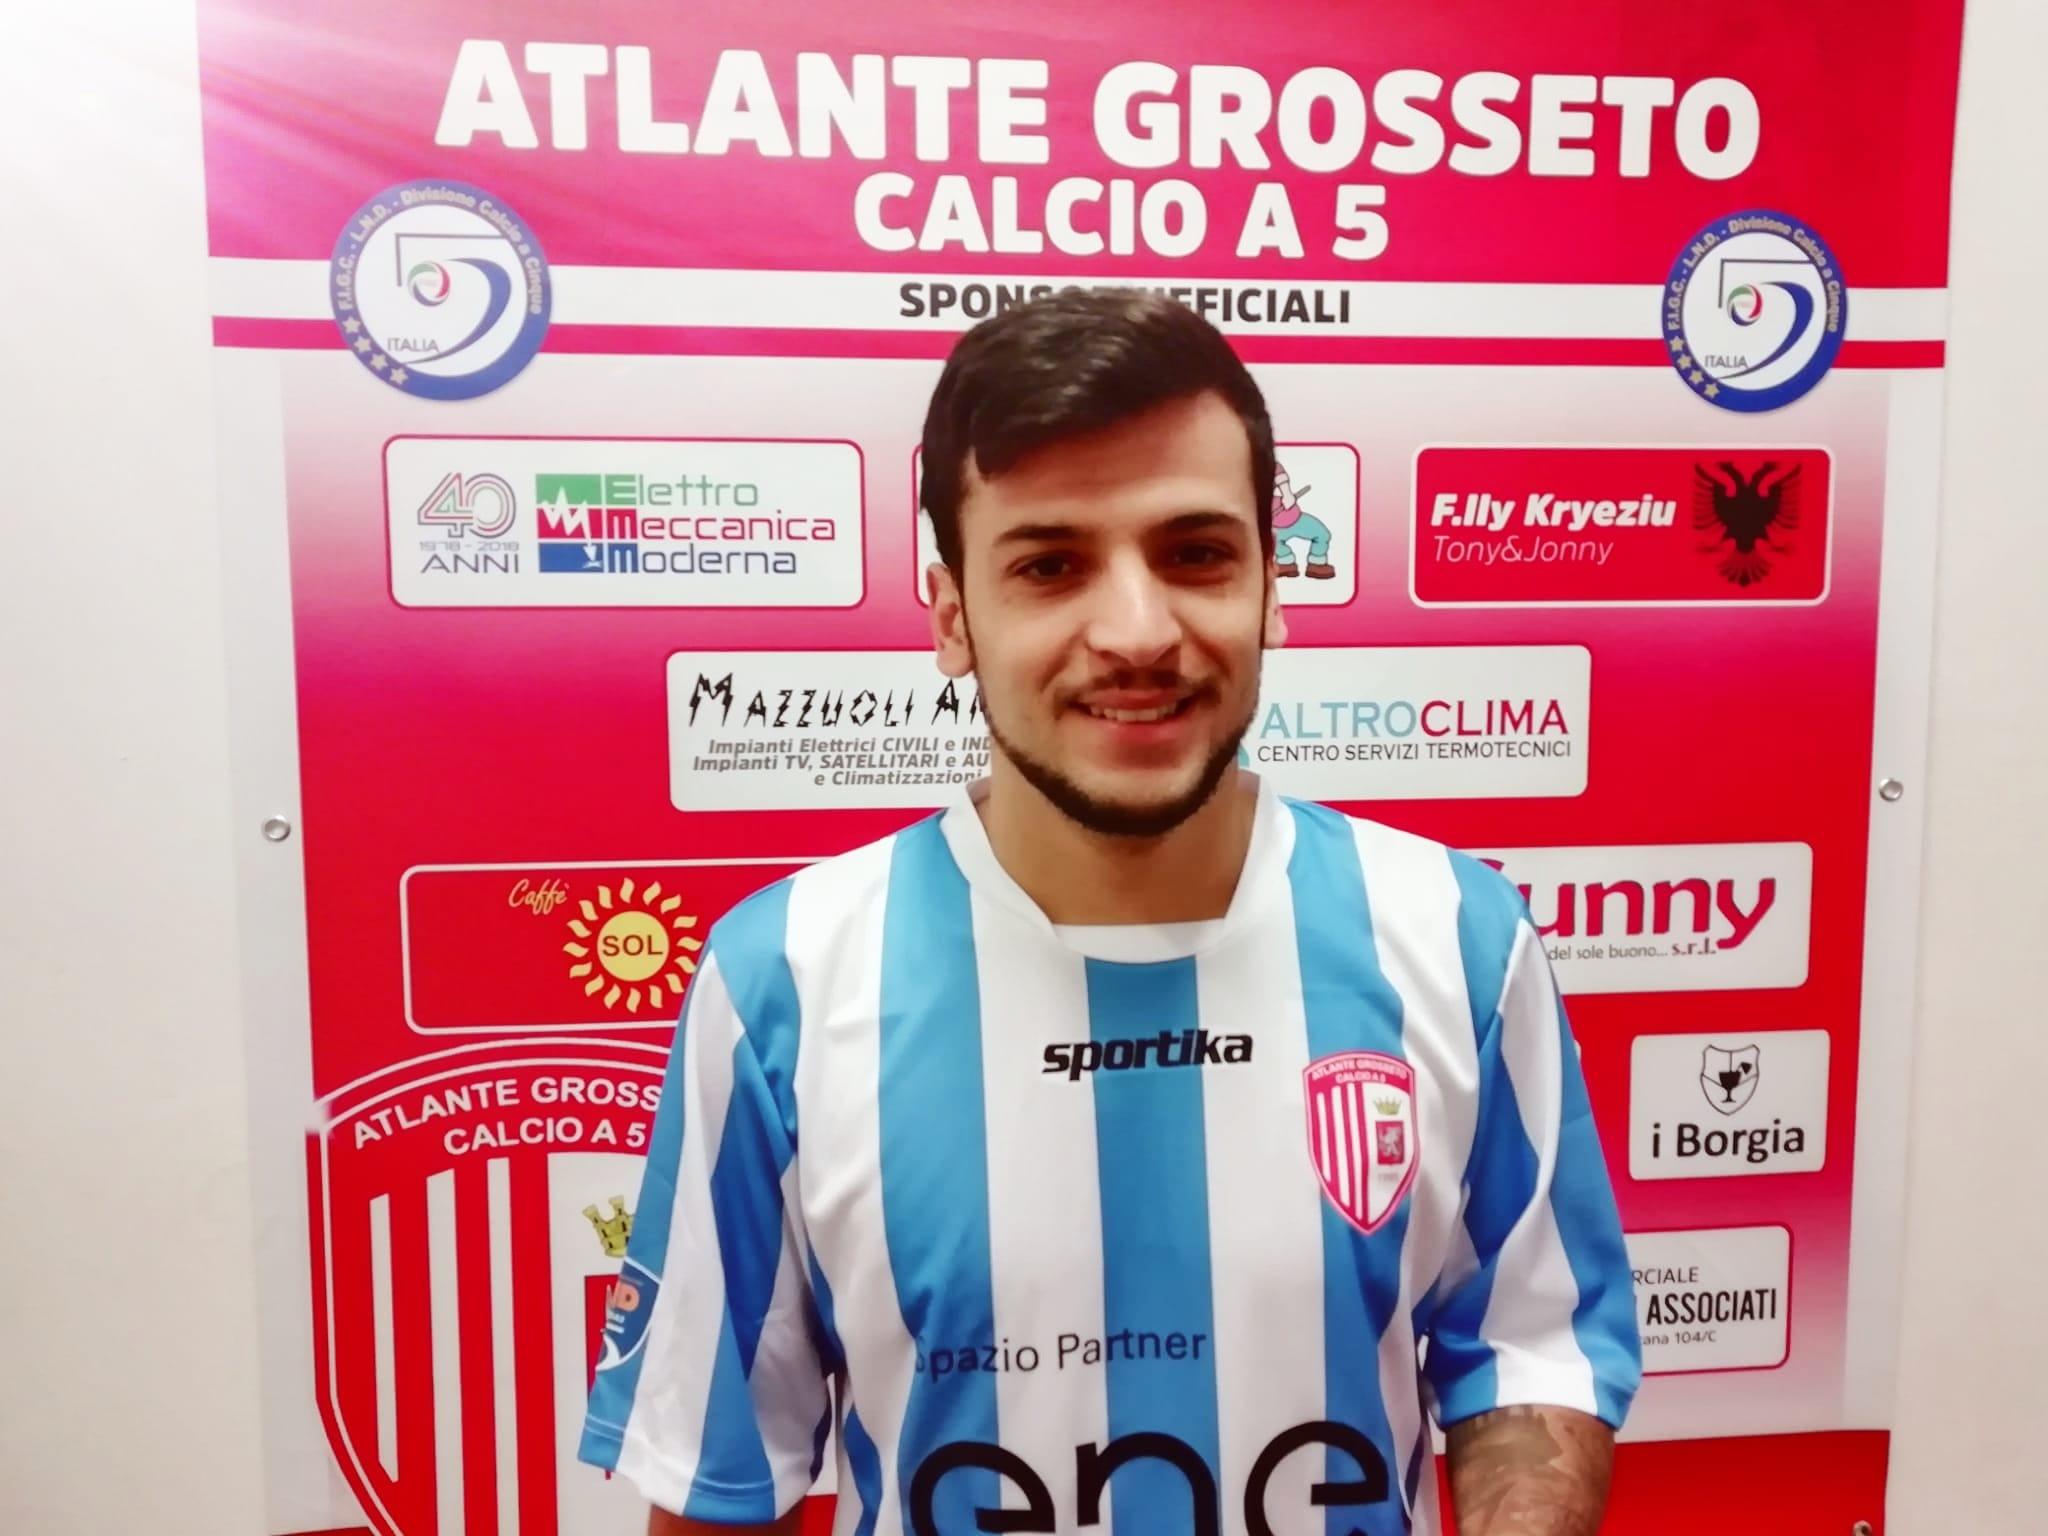 Diego Tezza Atlante Grosseto